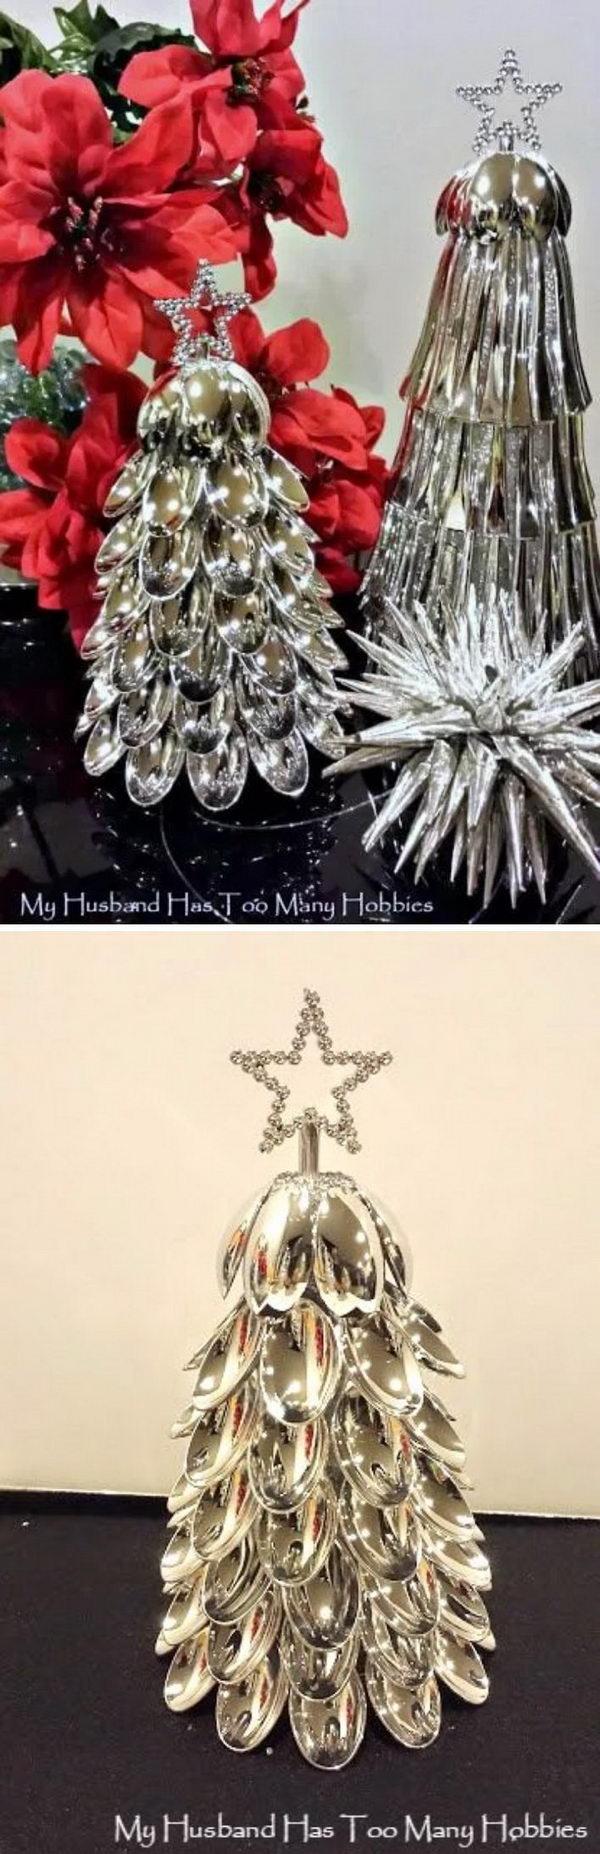 1. Spoon Christmas Tree